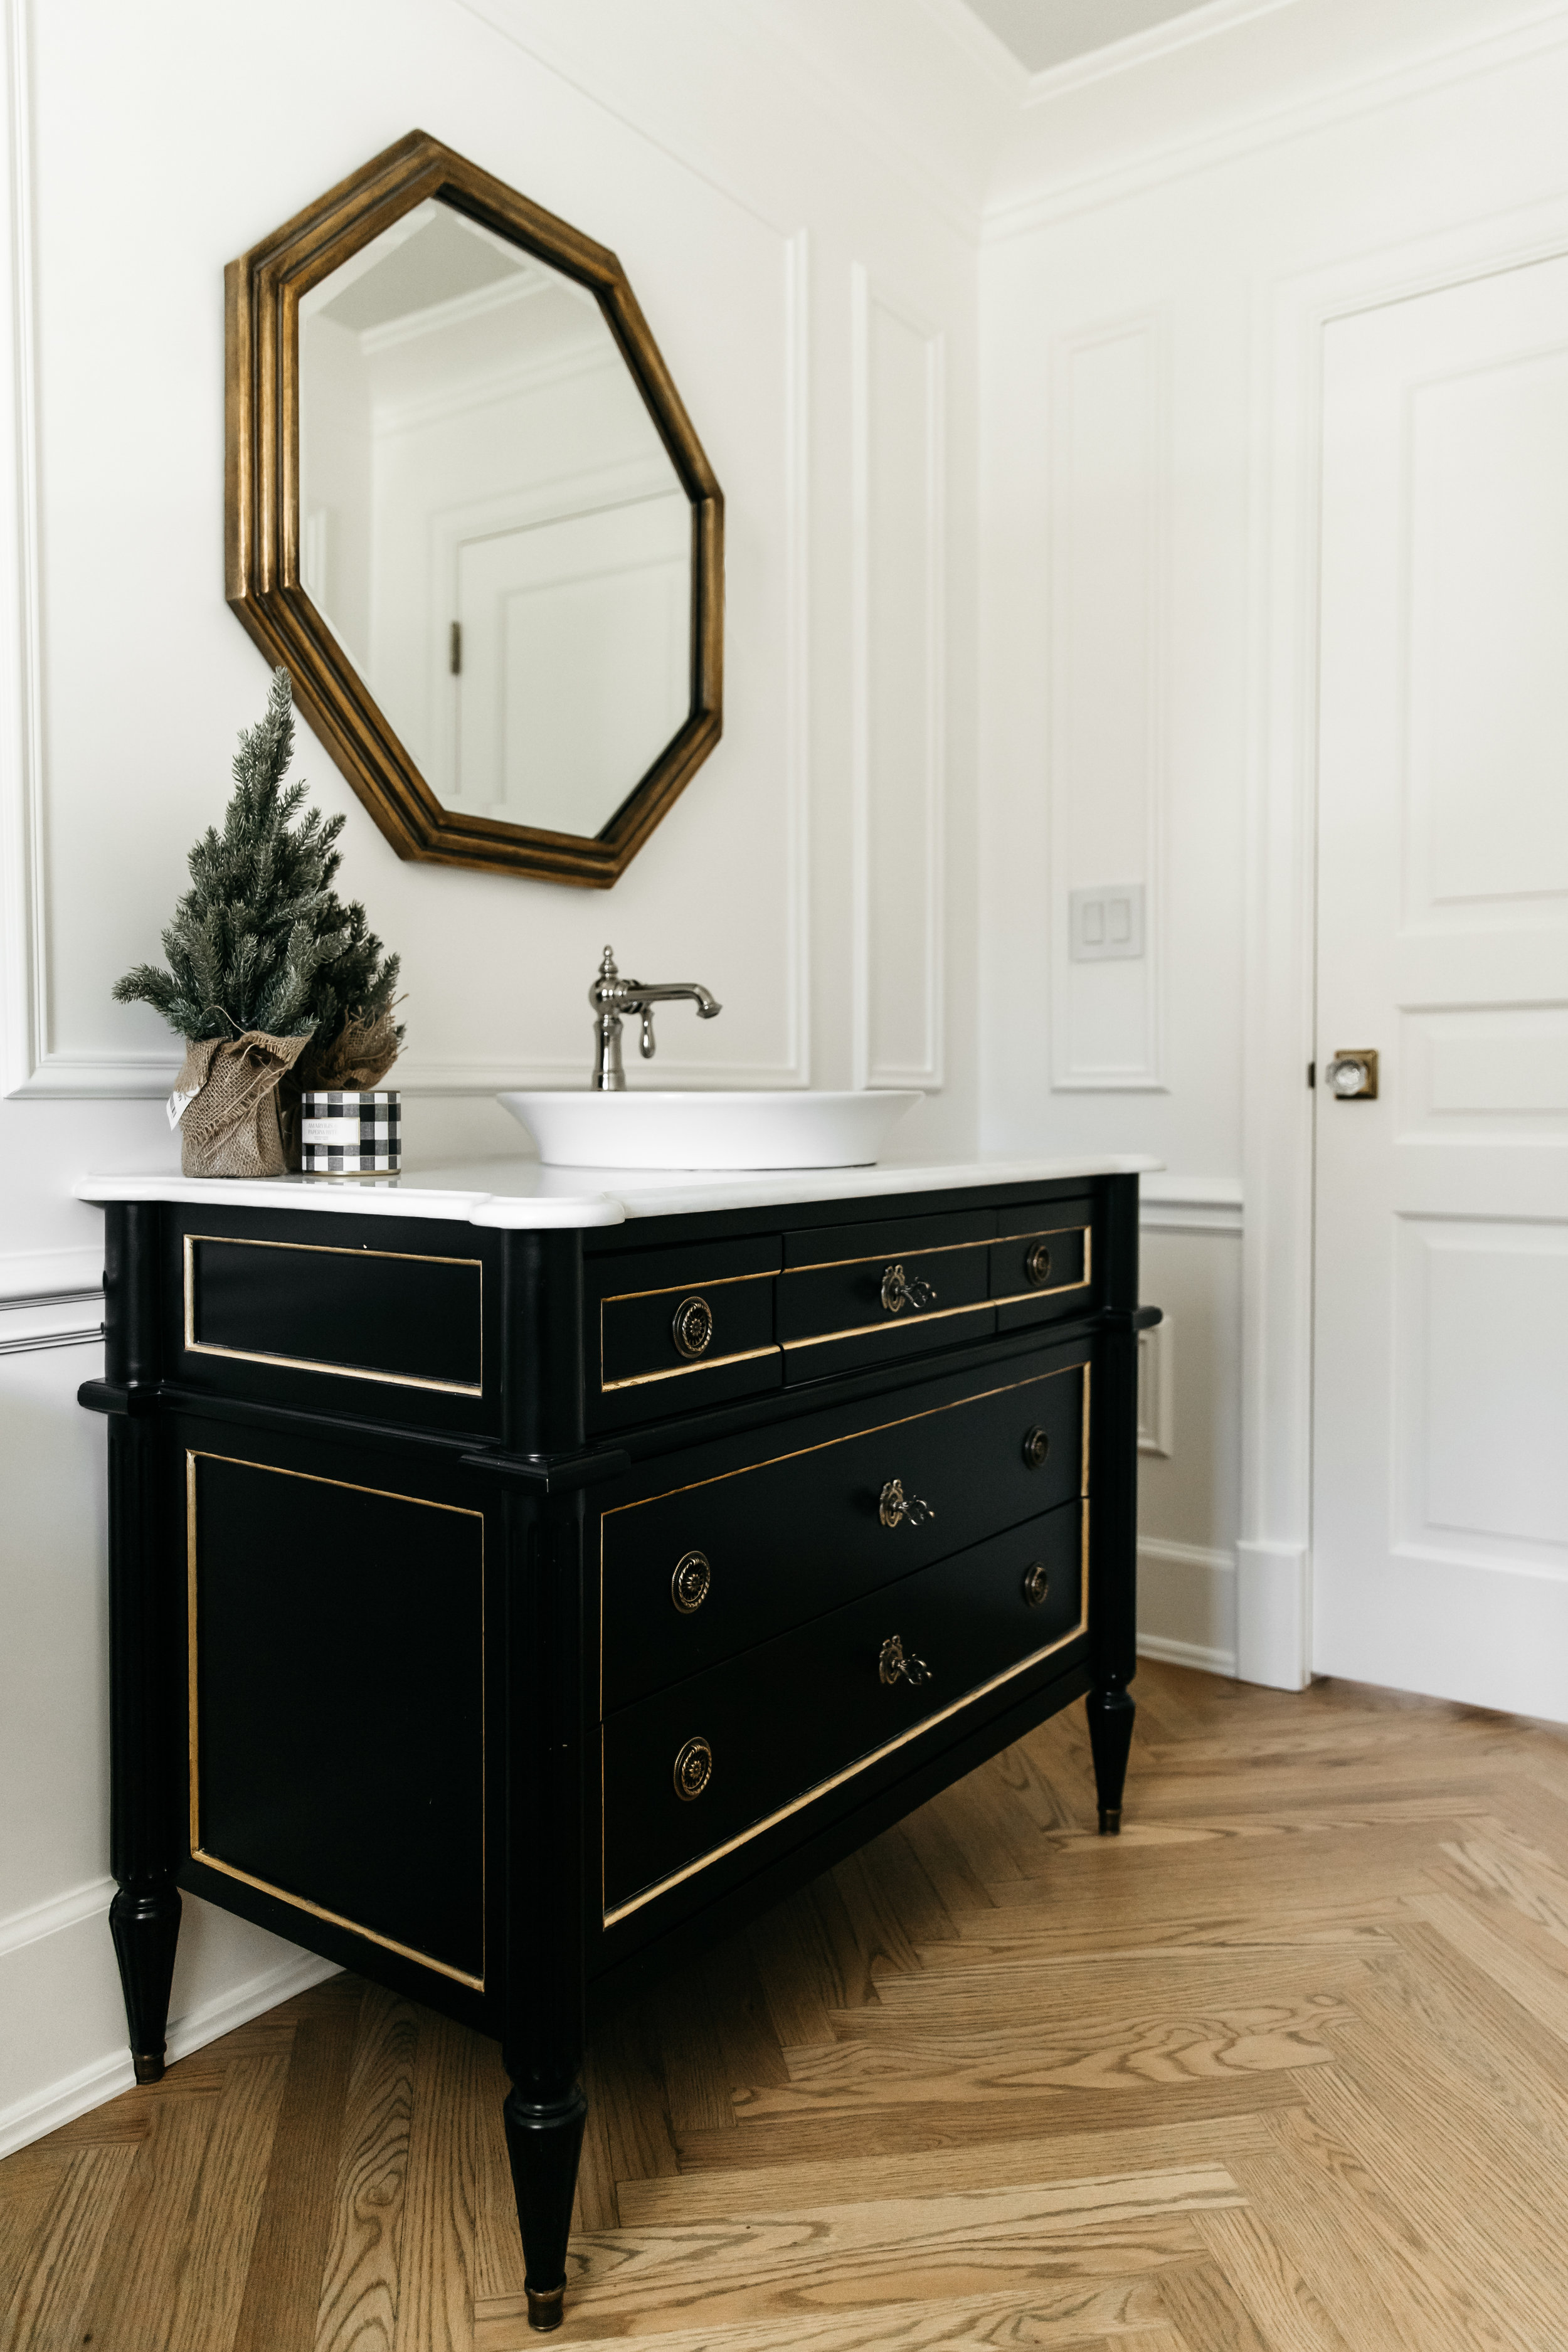 Black bathroom vanity with holiday decor